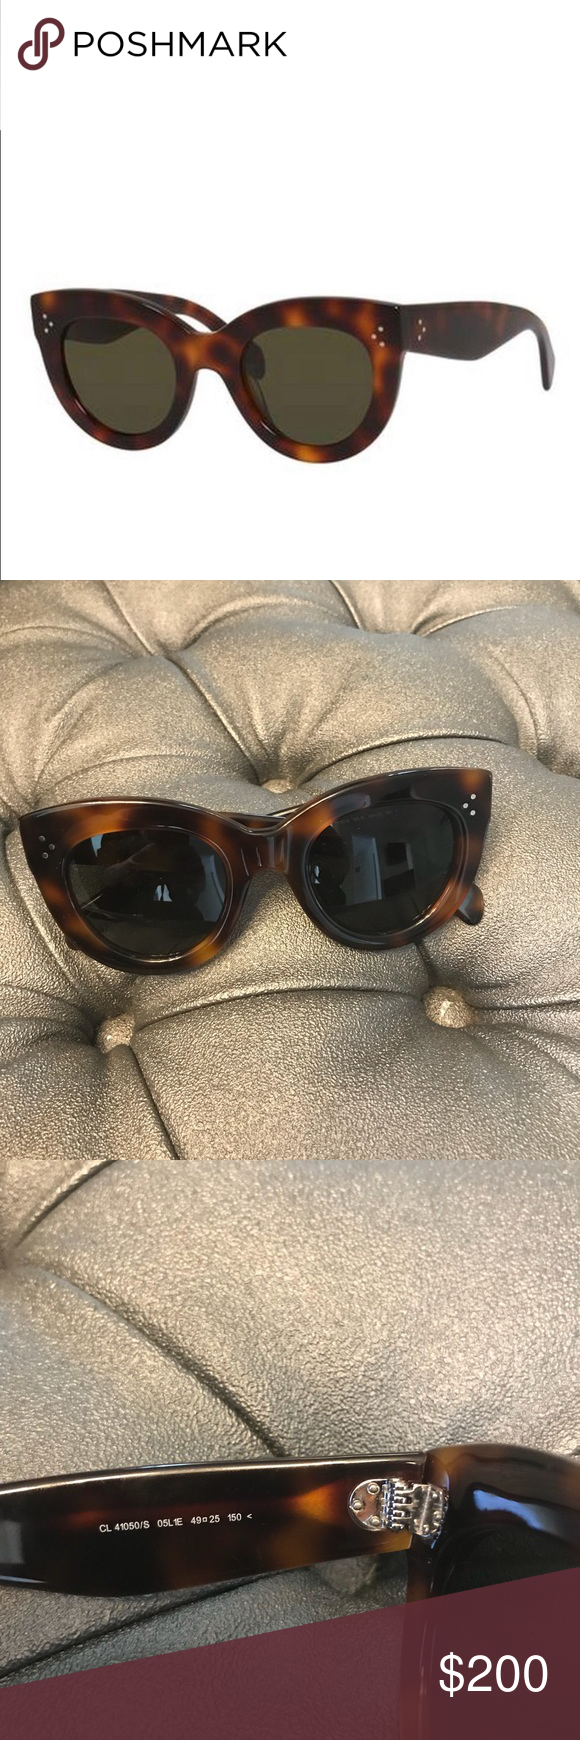 ceab7cb31275f Celine Havana Sunglasses A stalwart of the Celine sunglasses collection